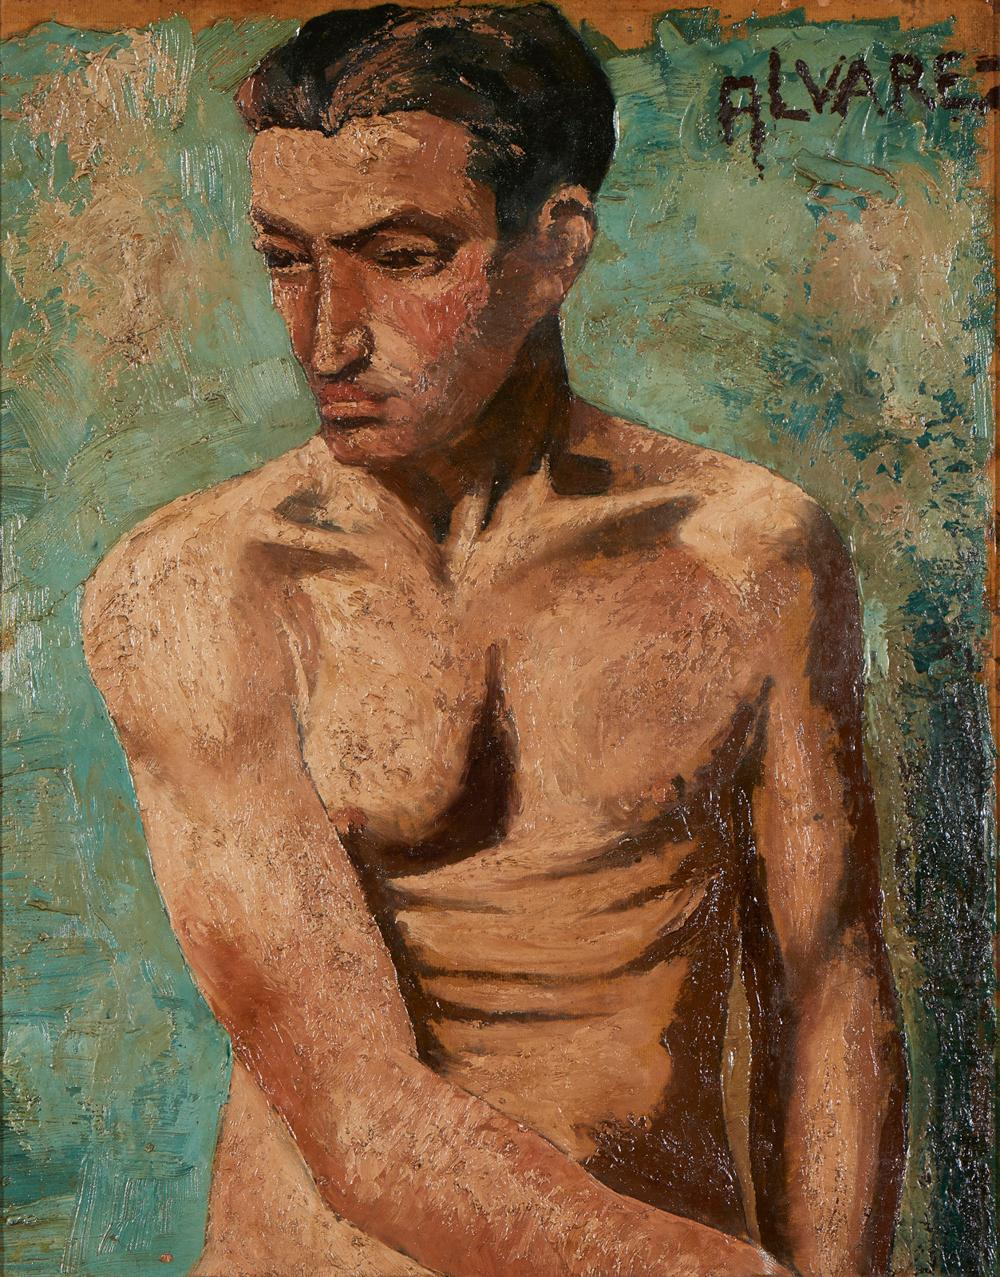 ALVAREZ, José, Óleo sobre tela 55 x 43 cm.